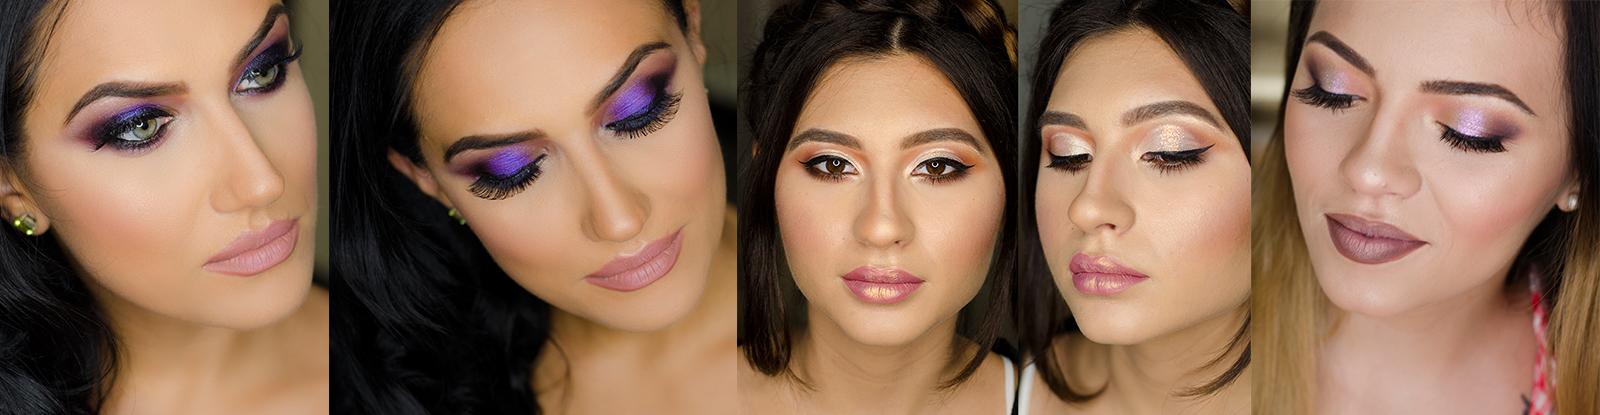 Cum sa faci fotografii de makeup